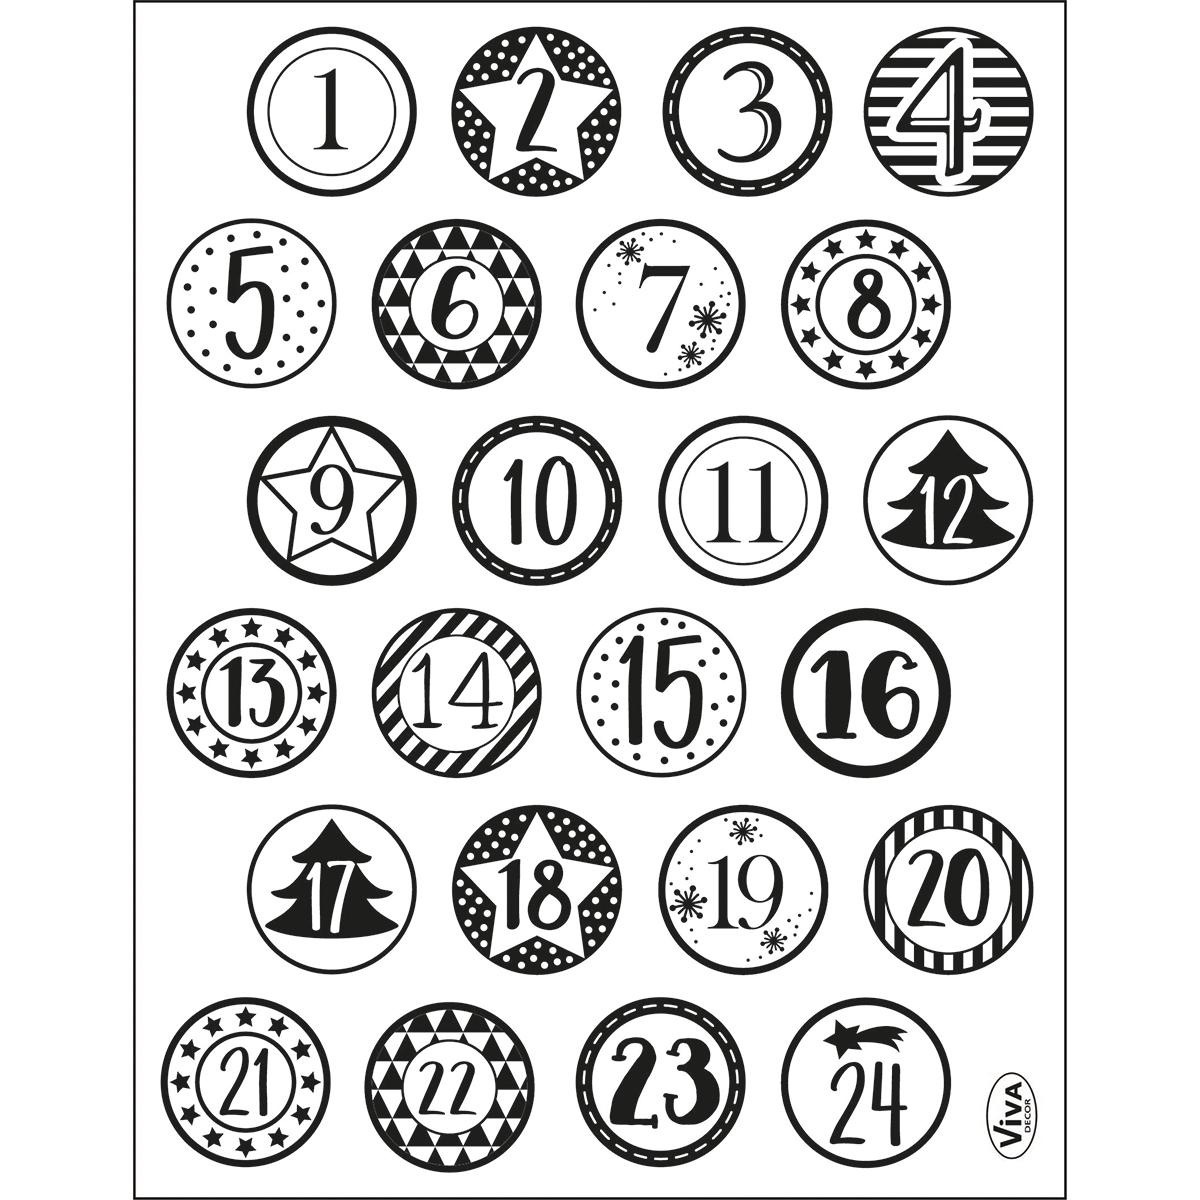 Kalendertext Stempel Clearstamp von ViVa Decor 4003.207.00 Monate /& Tage